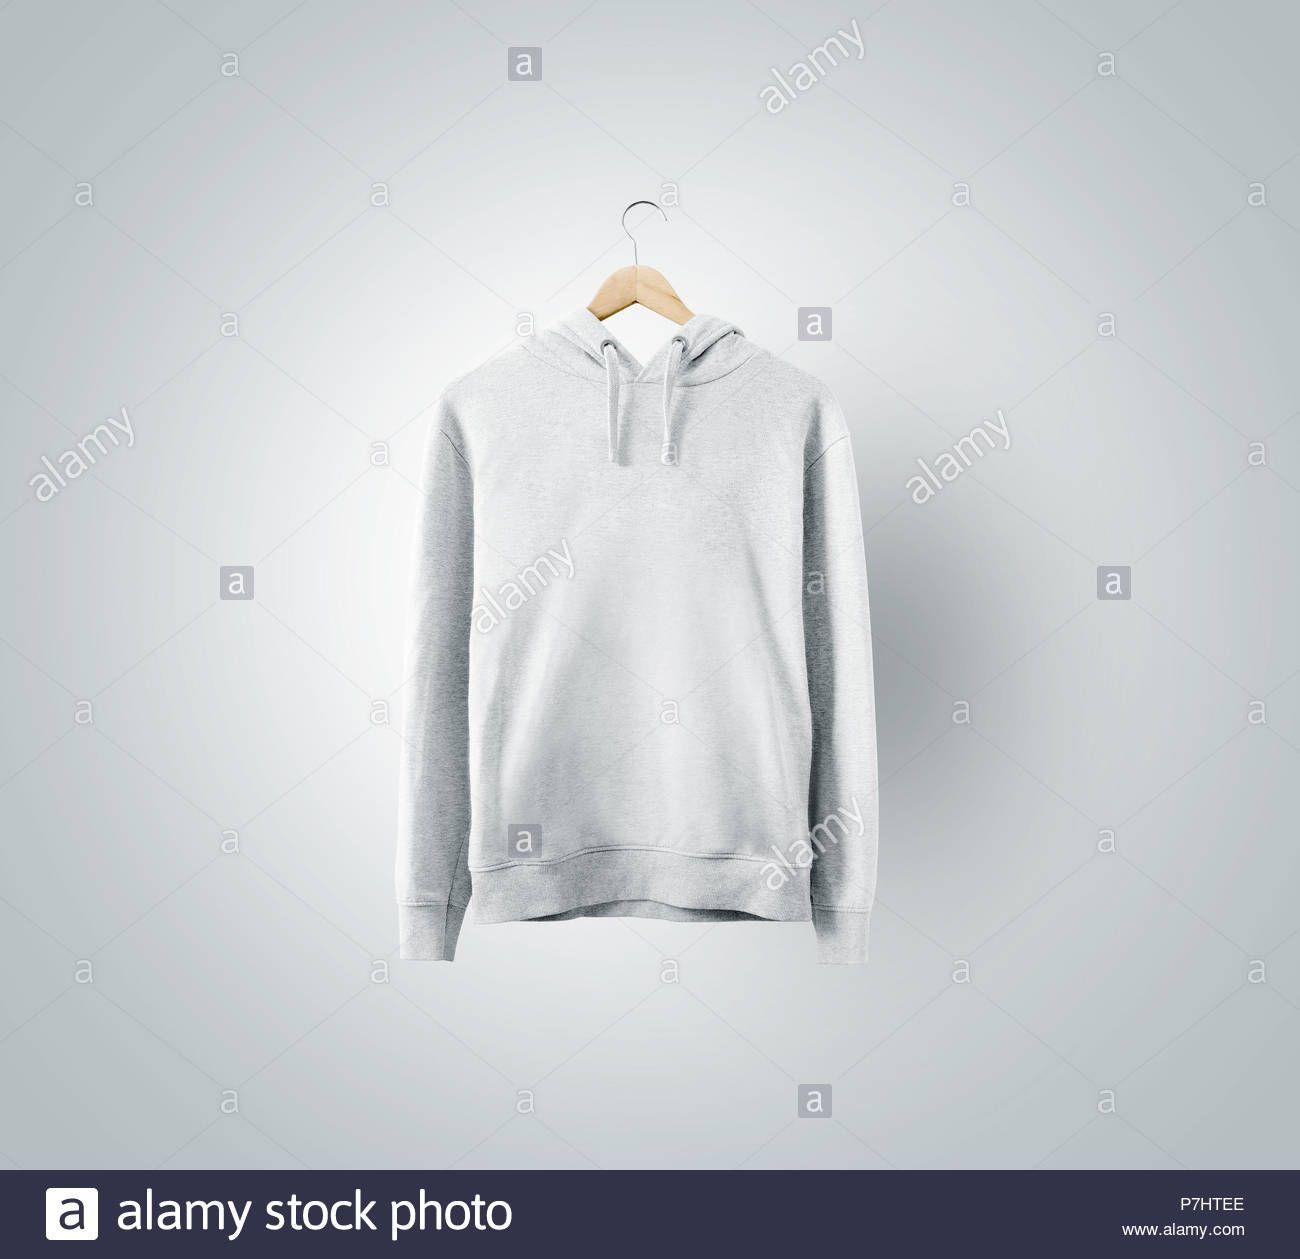 Download Stock Photo Blank White Sweatshirt Mockup Hanging On Wooden Hanger Empty Sweat Shirt Mock White Sweatshirt Sweatshirts Casual Jumpers